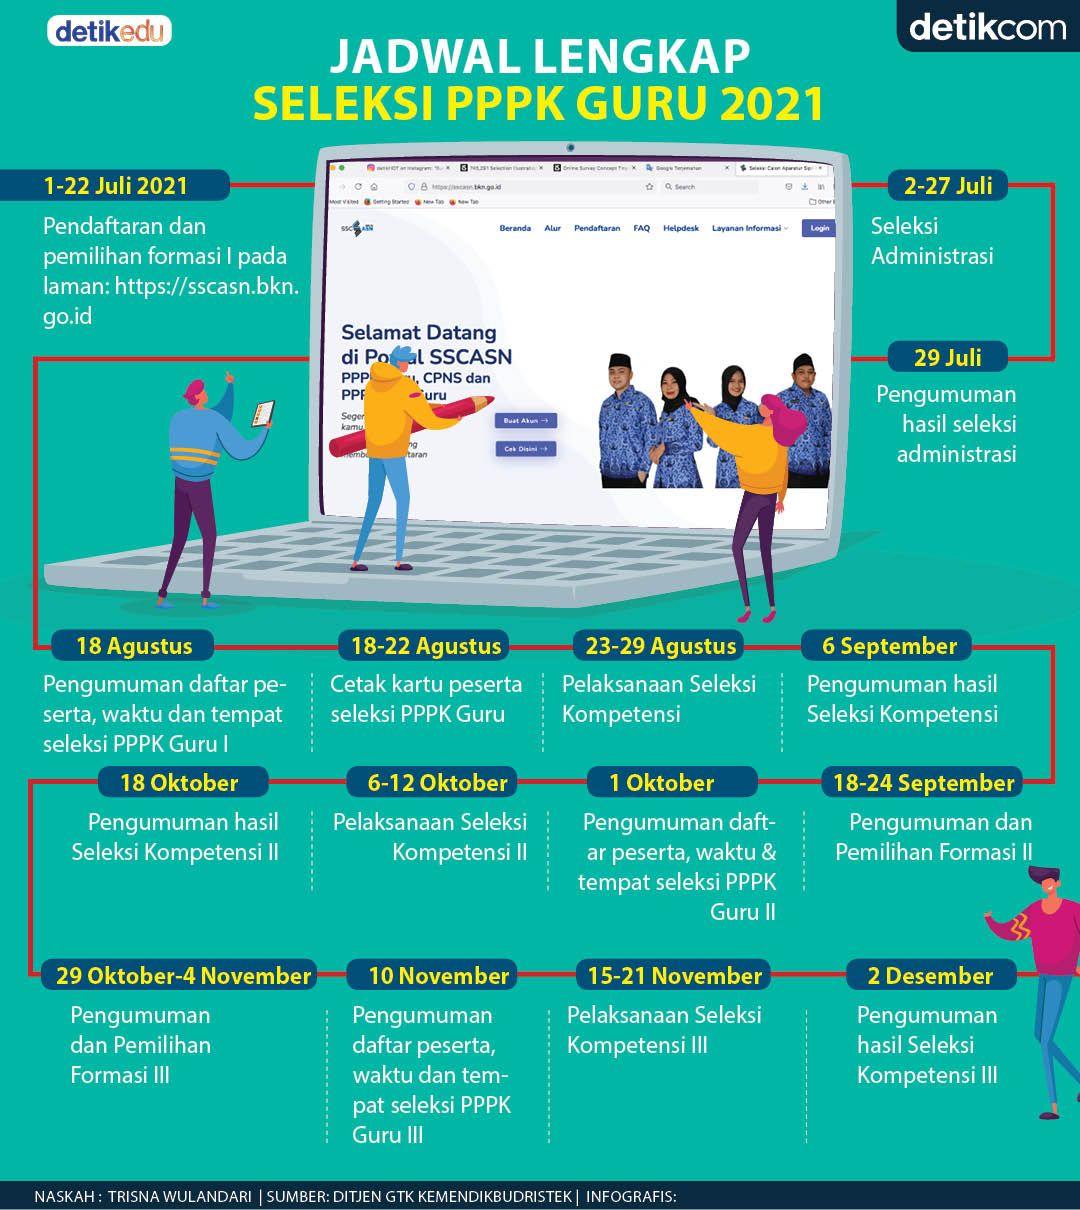 Jadwal lengkap seleksi PPPK Guru 2021